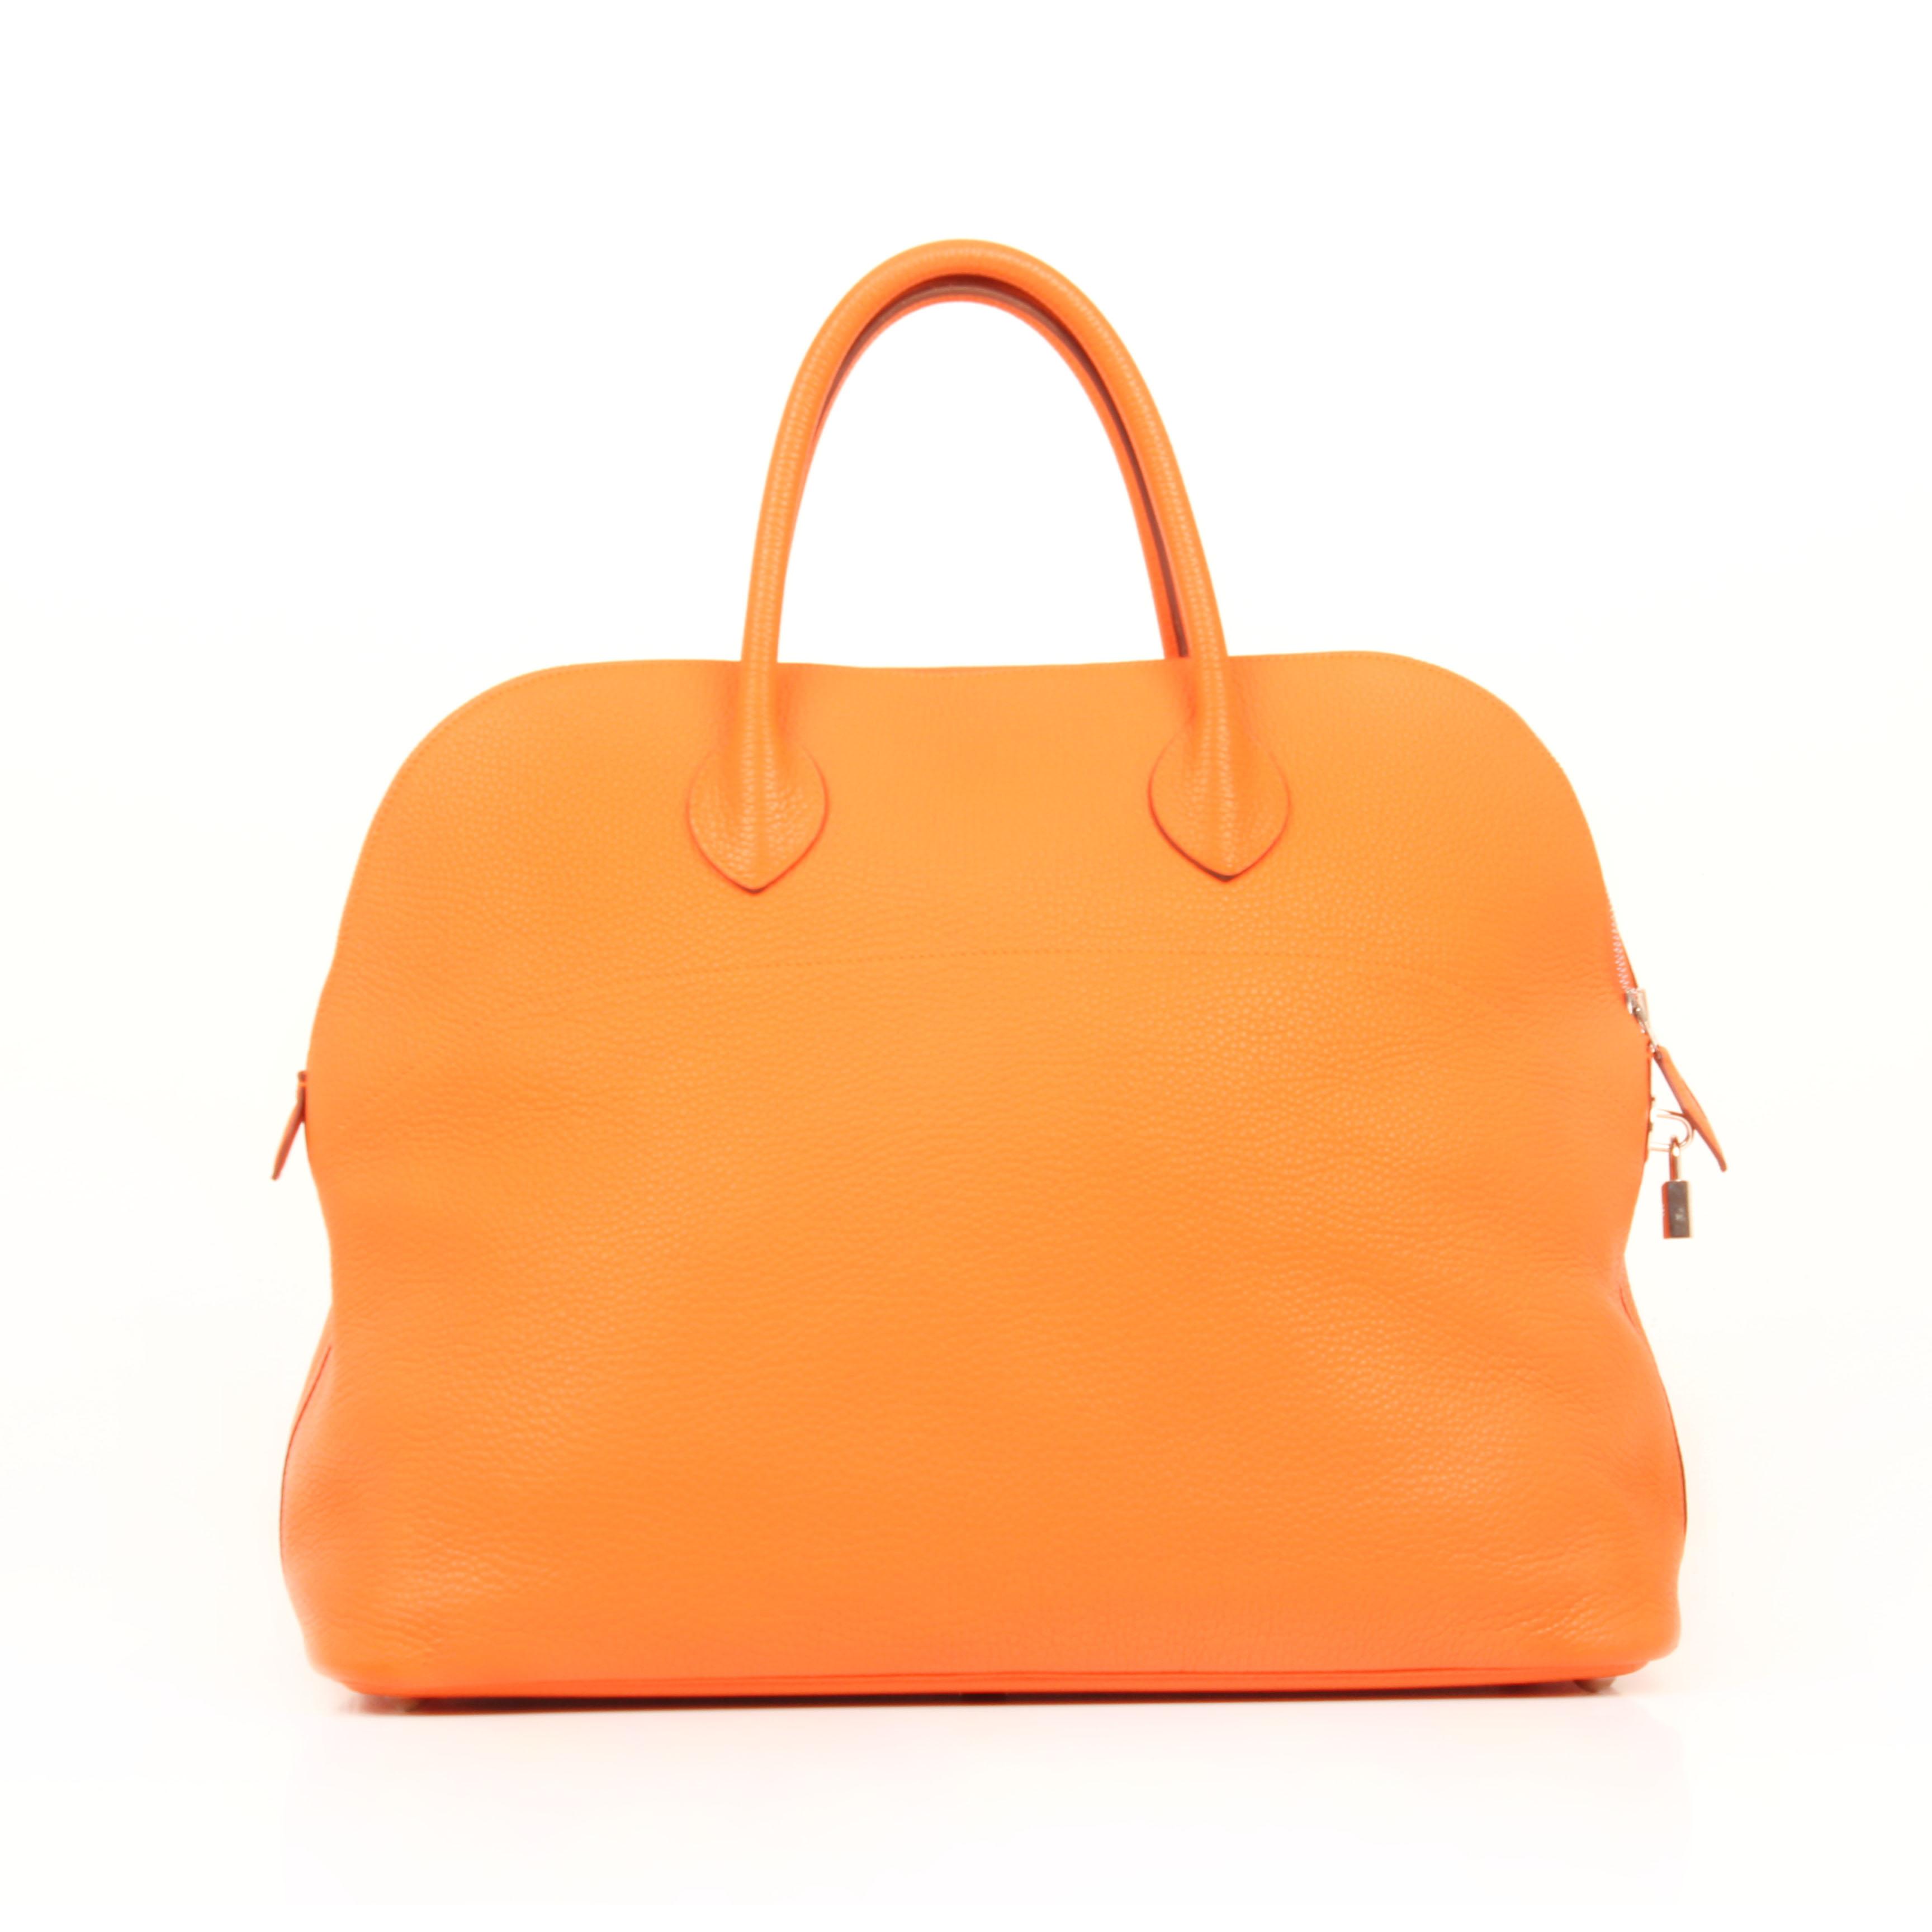 bolsa de viaje hermes bolide 45 piel togo naranja trasera